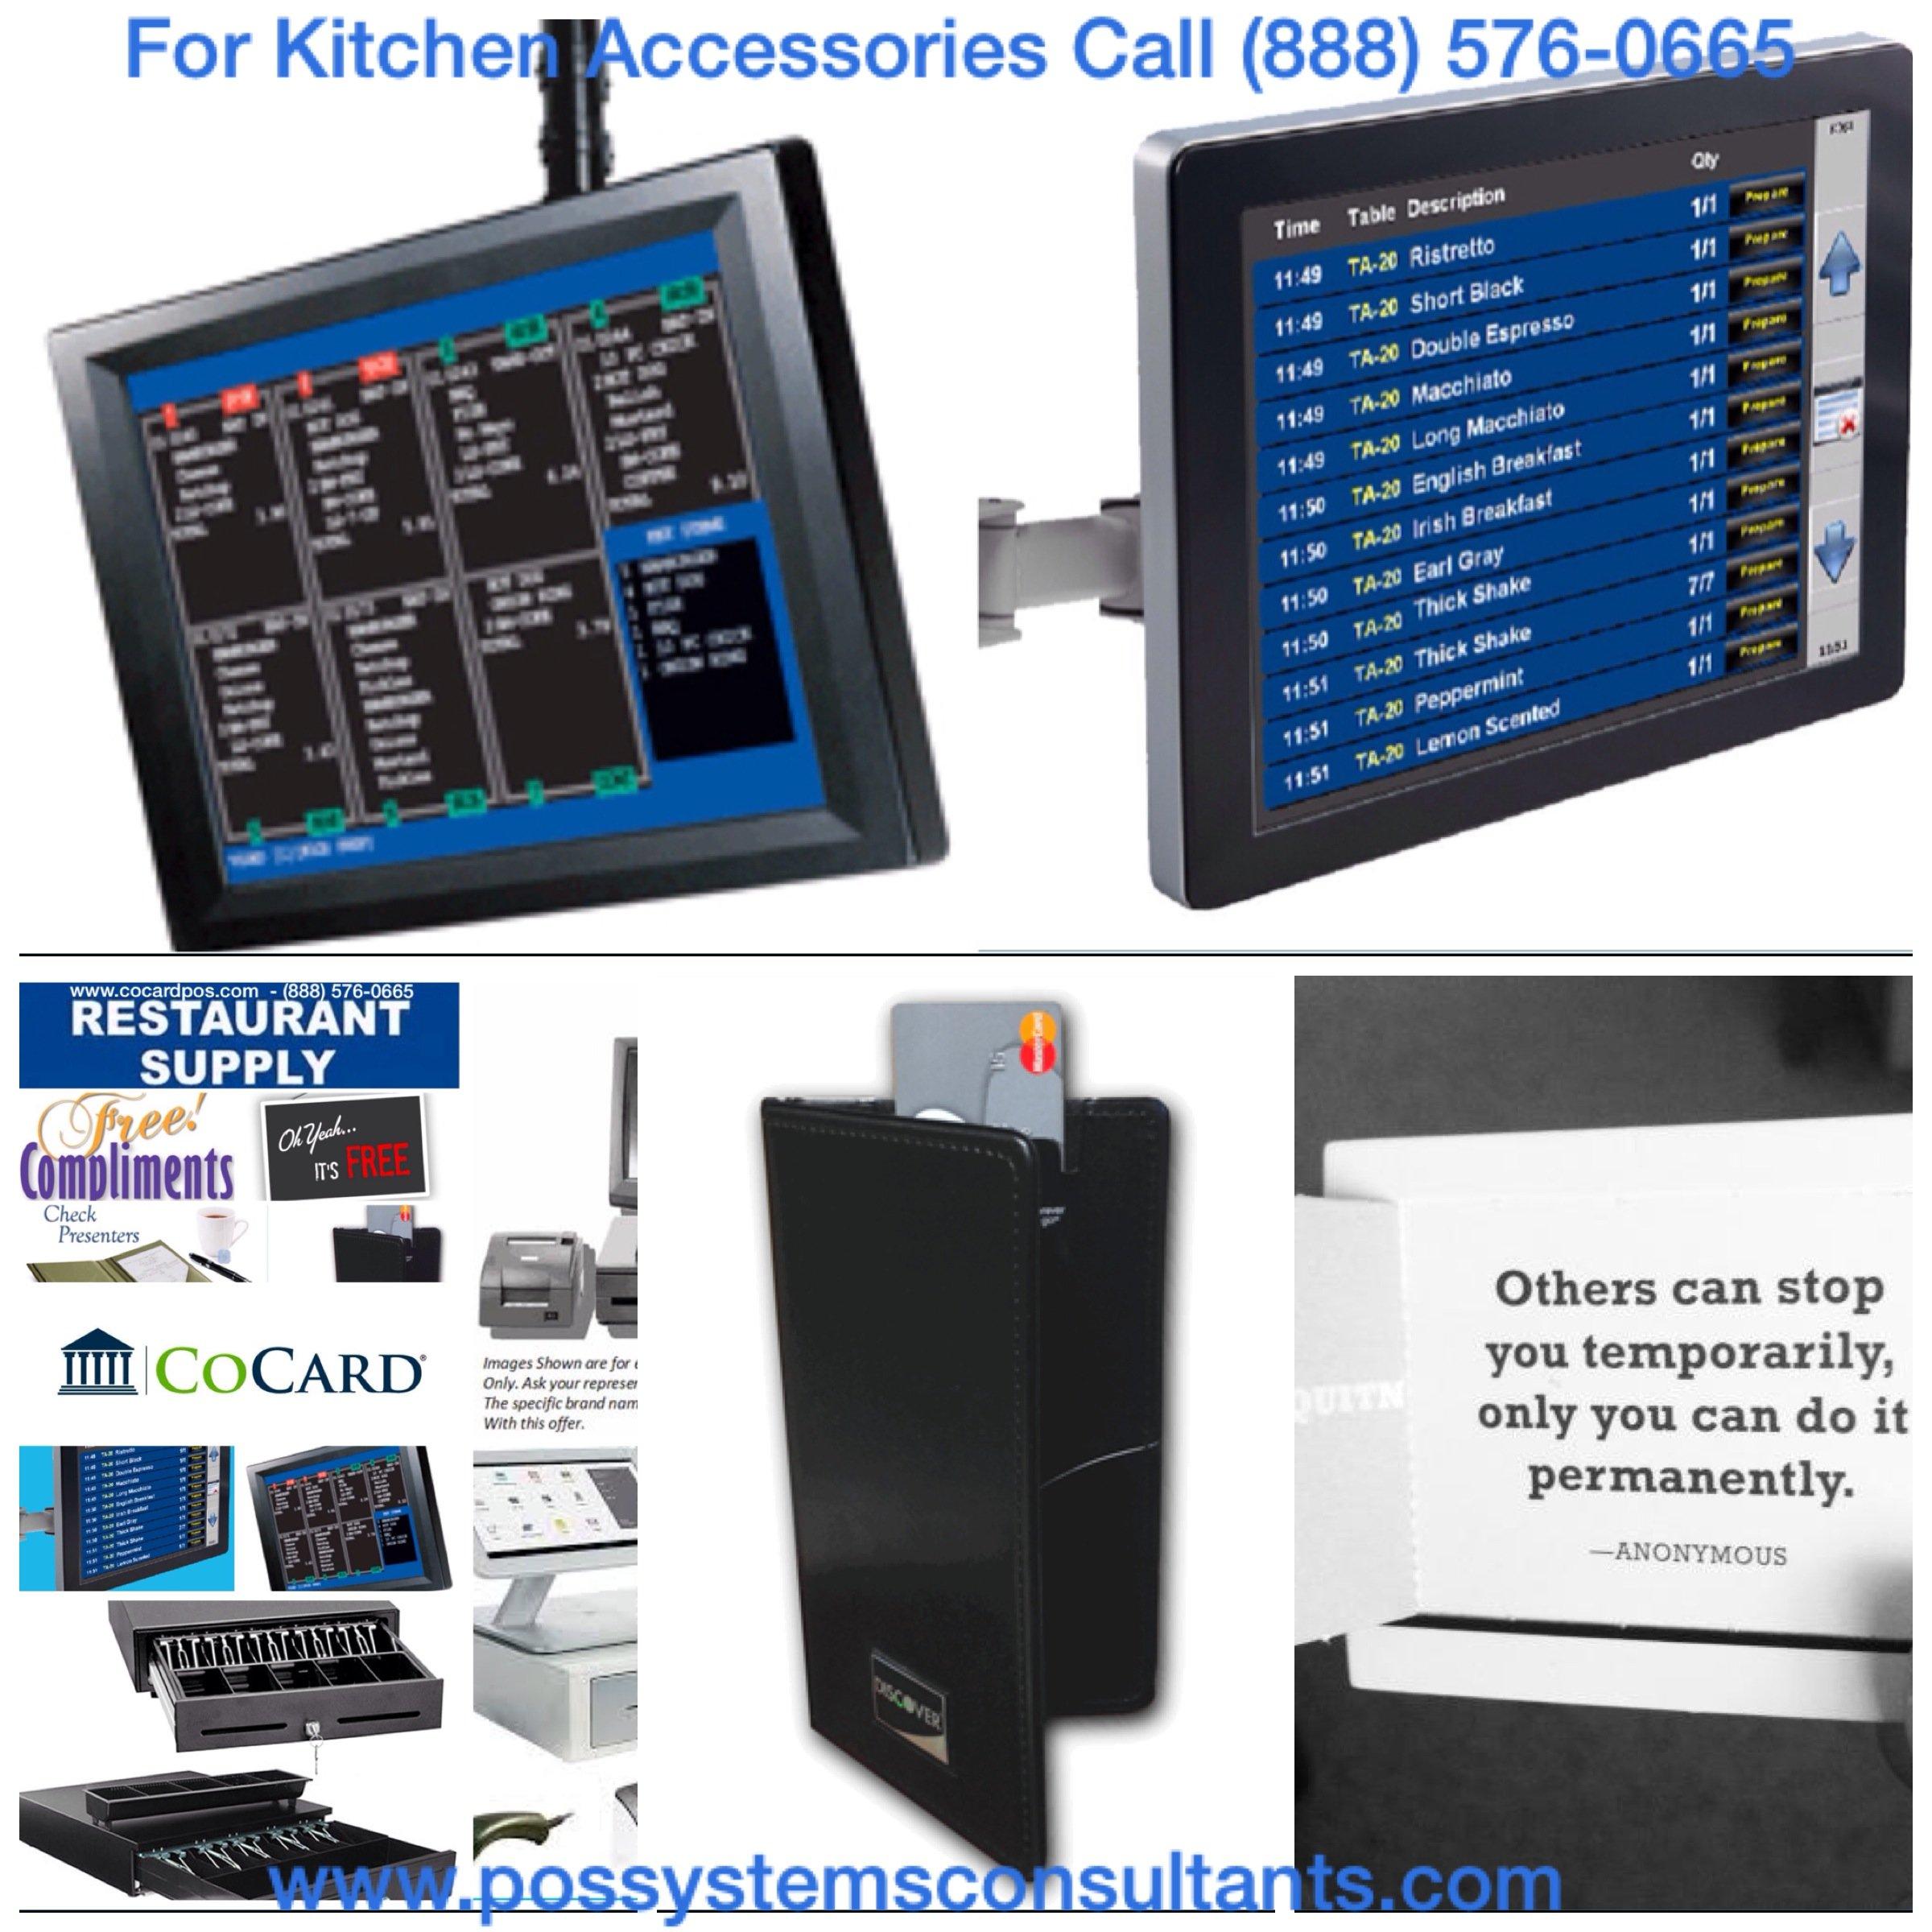 POS Peoples Merchant Services LLC dba CoCard Los Angeles is ...